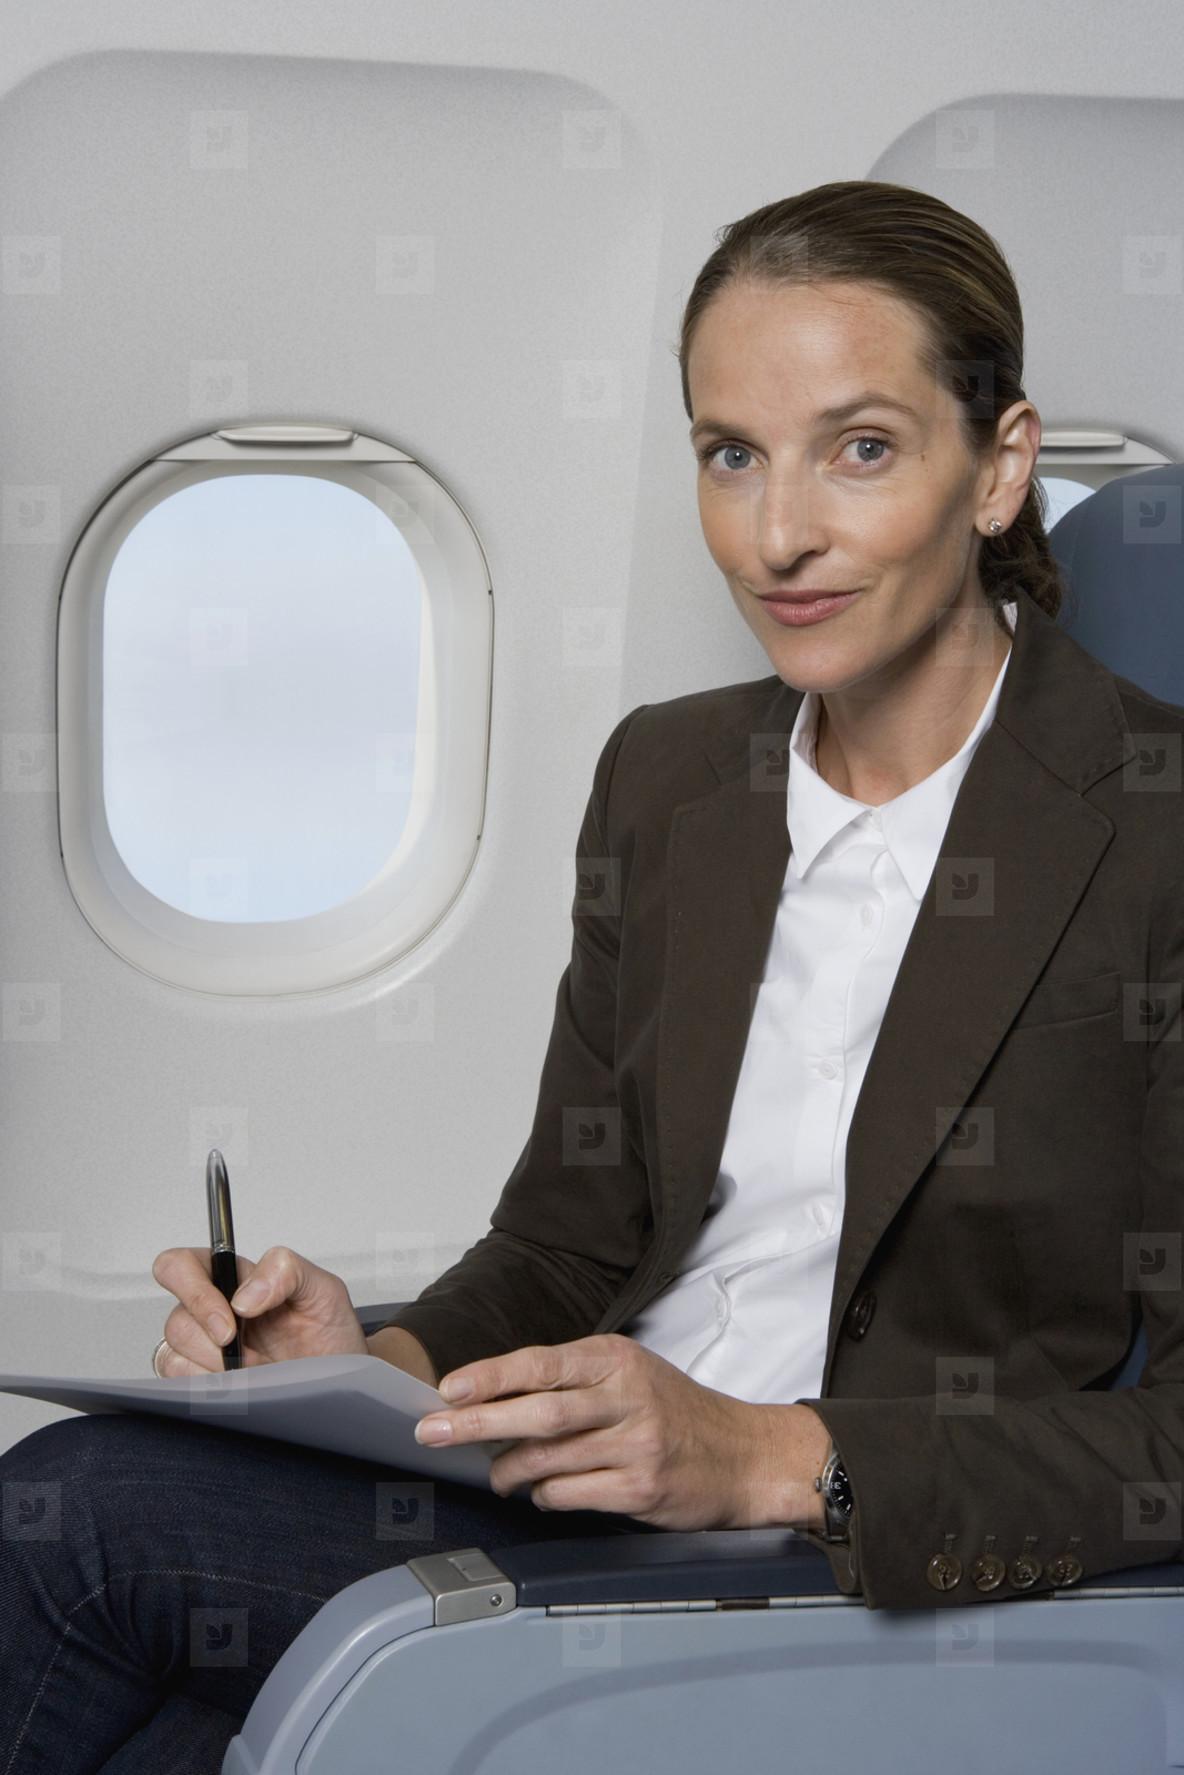 Airplane Travel  69